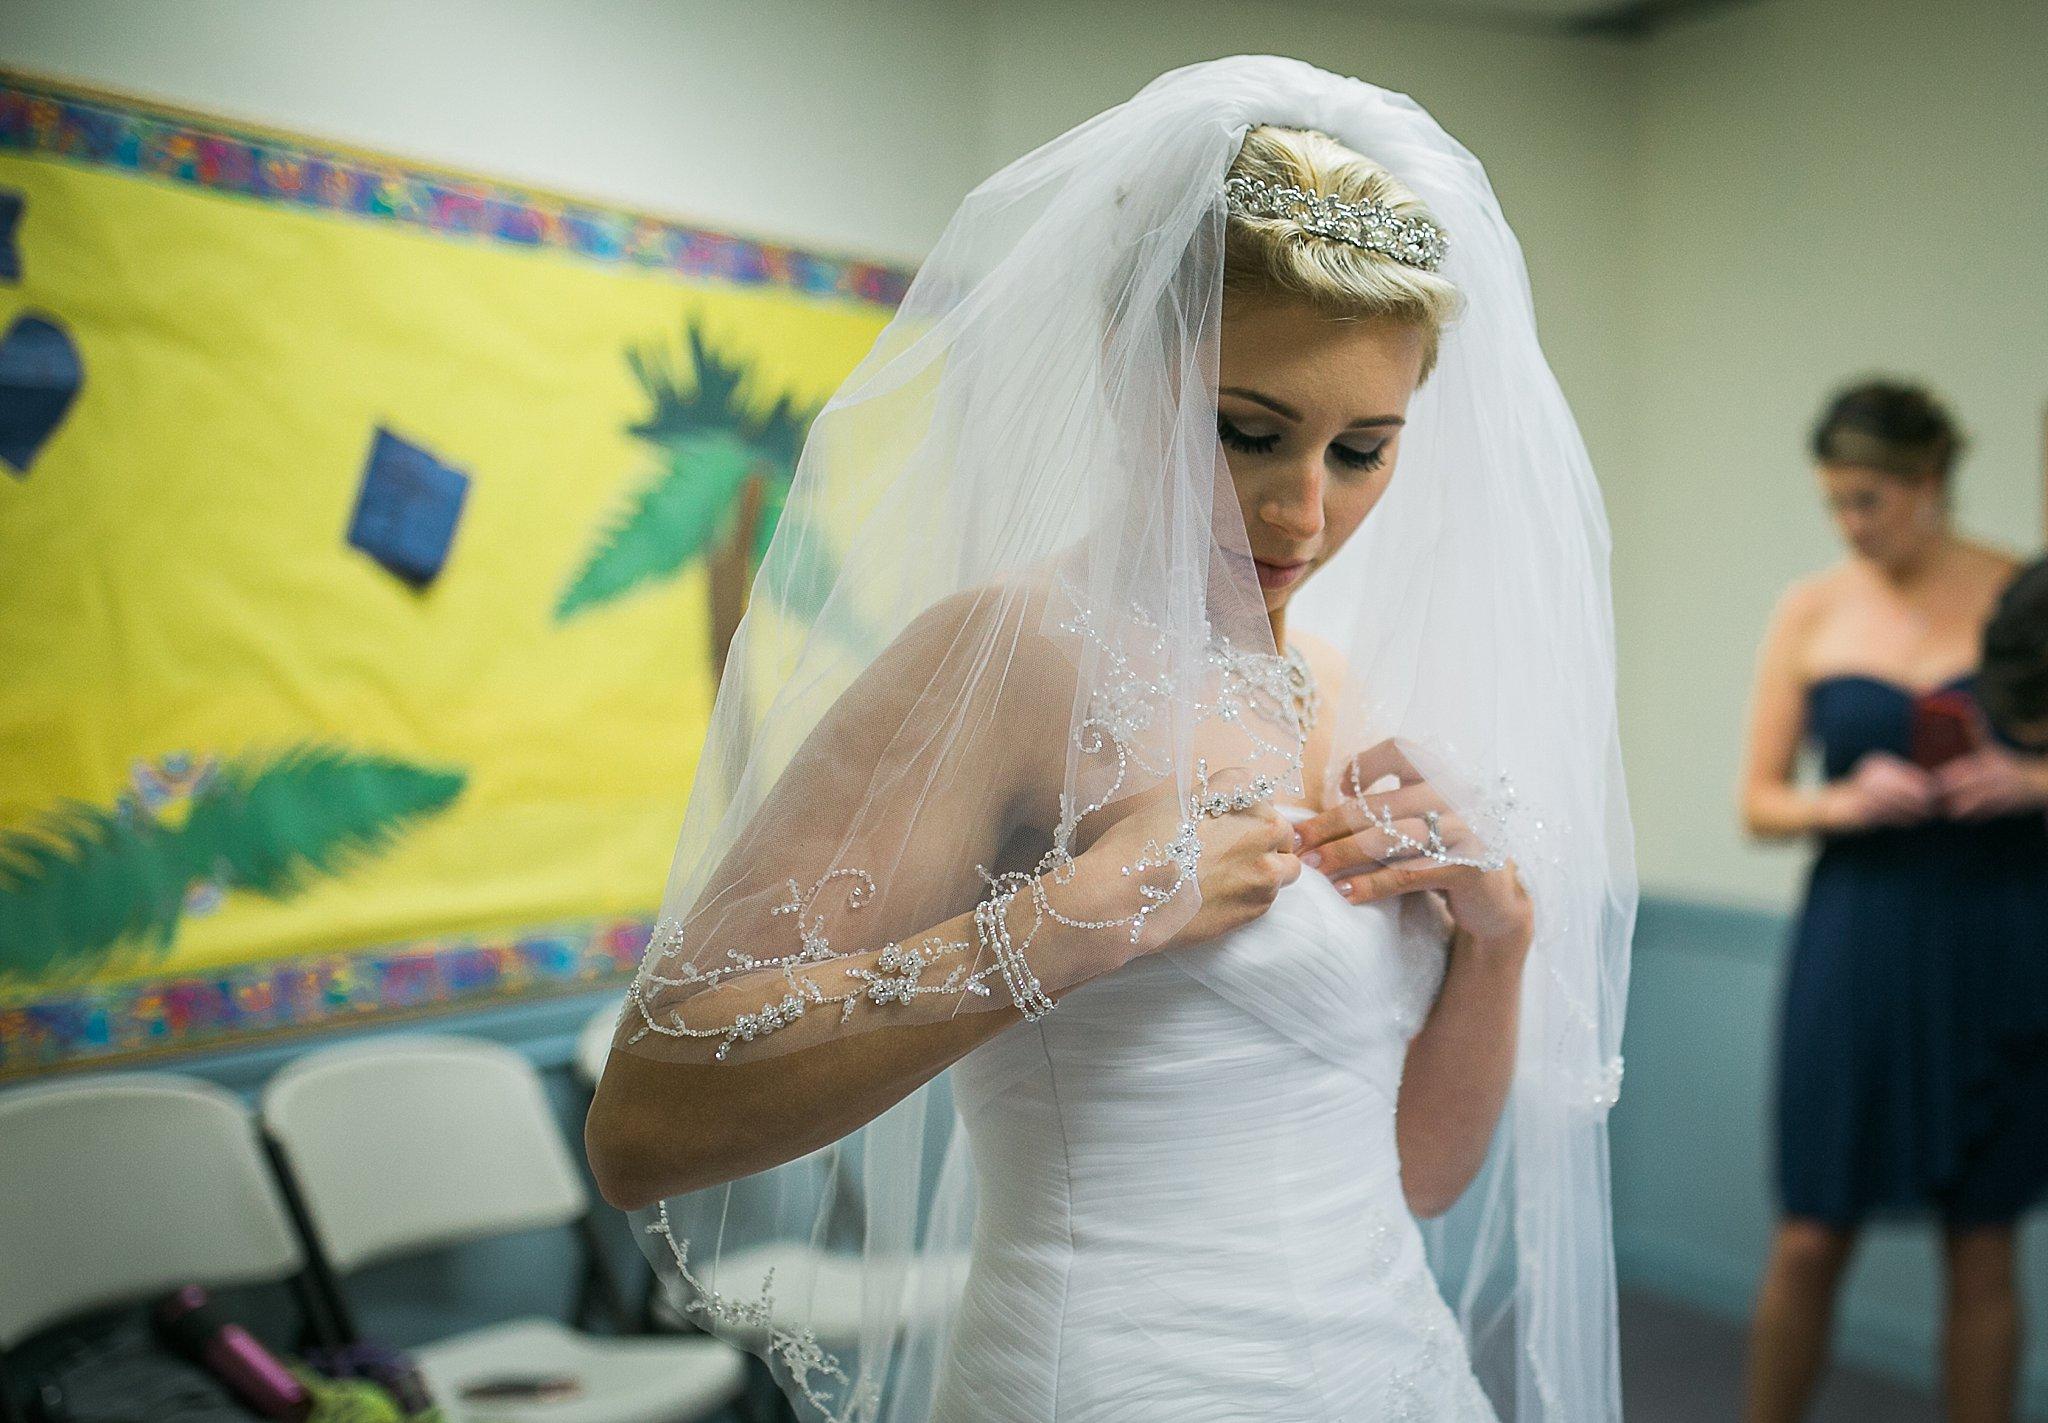 Wollaston Church of the Nazarene Wedding Boston Wedding Photographer9.jpg